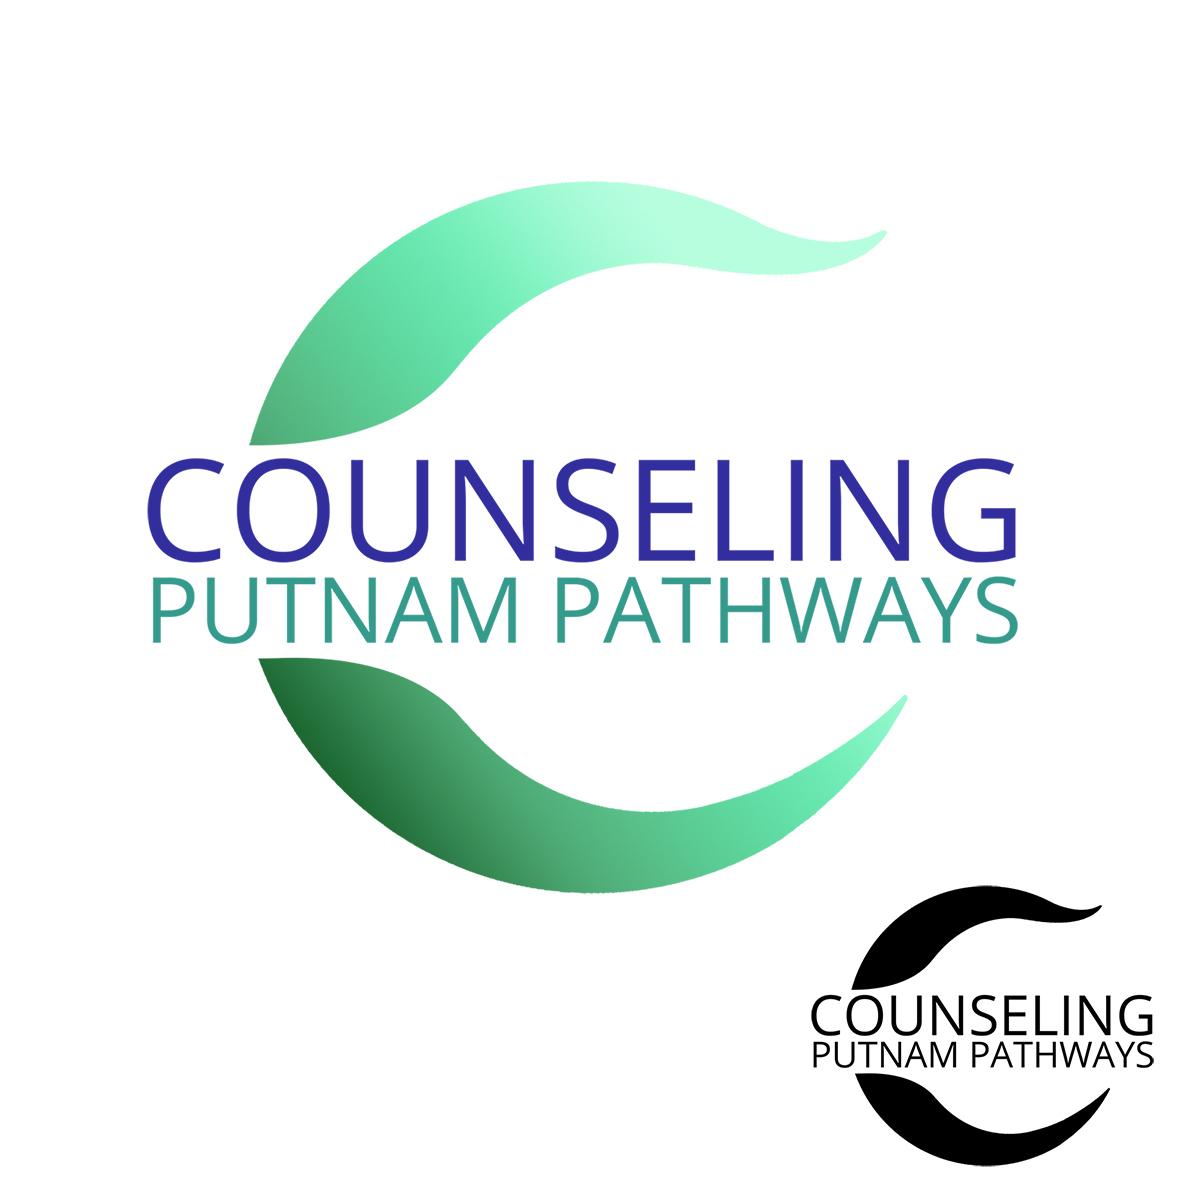 Portfolio Counseling Logo 2.jpg